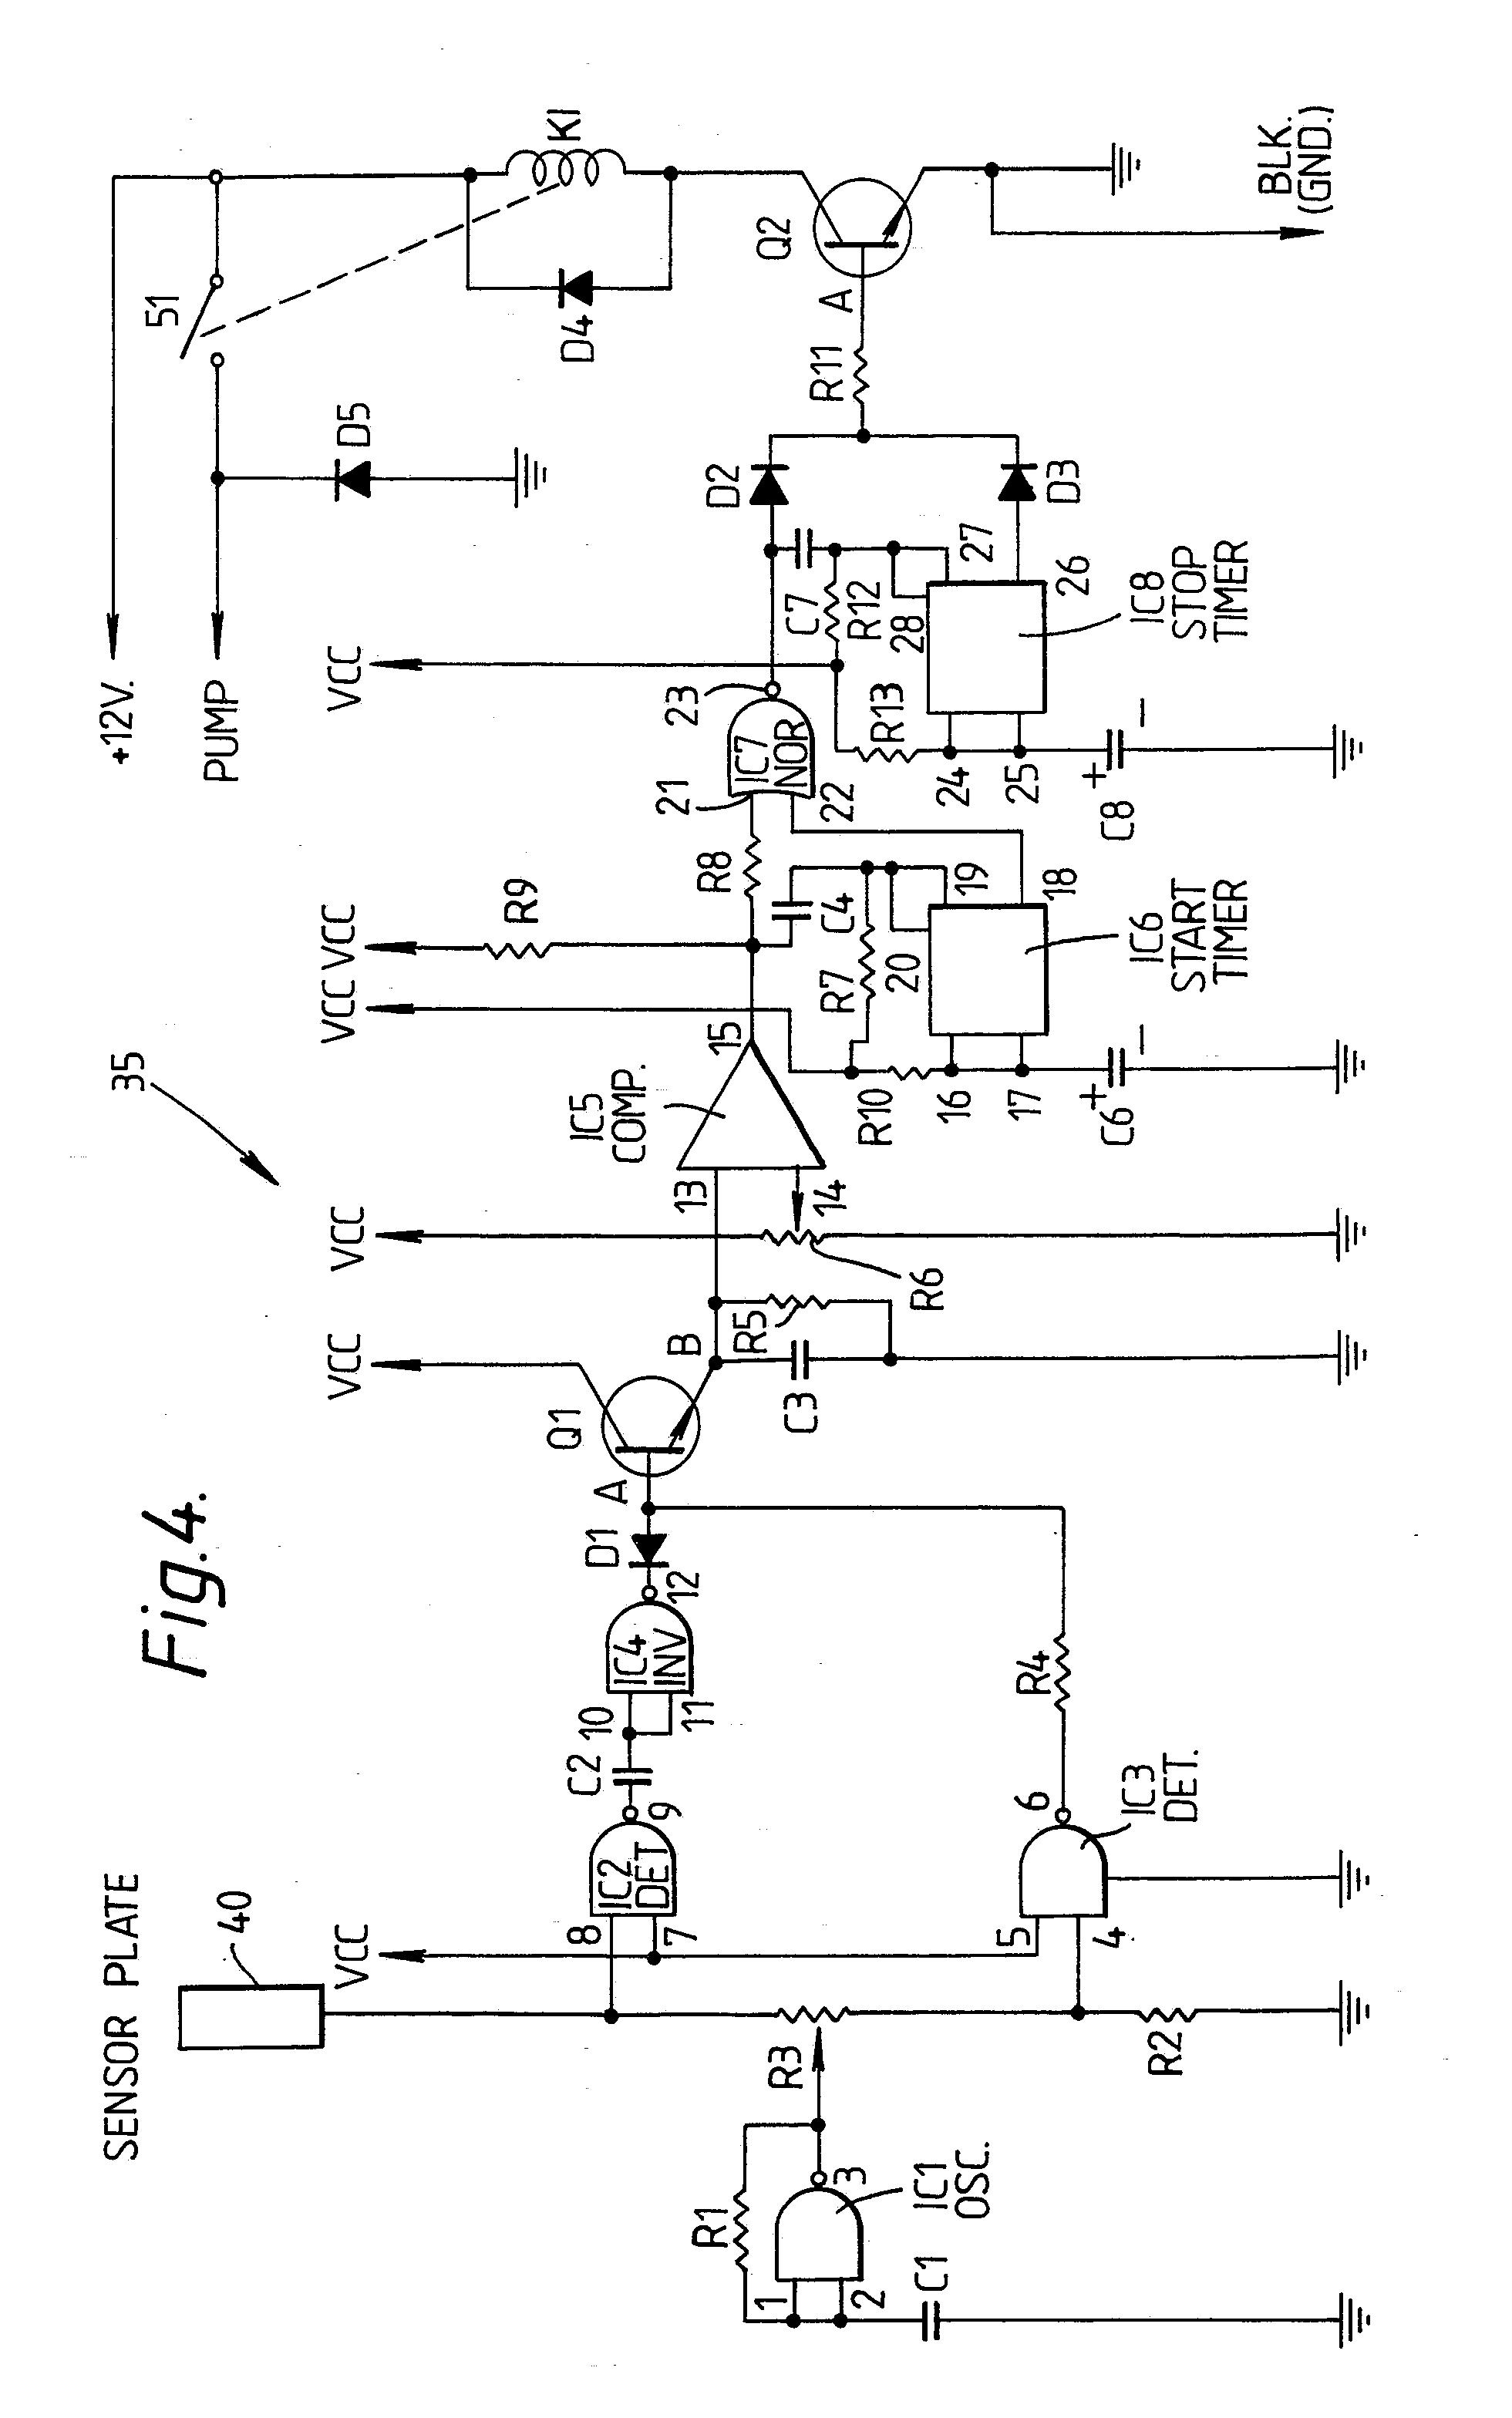 patent ep0373809a2 - ultrasonicc bilge pump control device